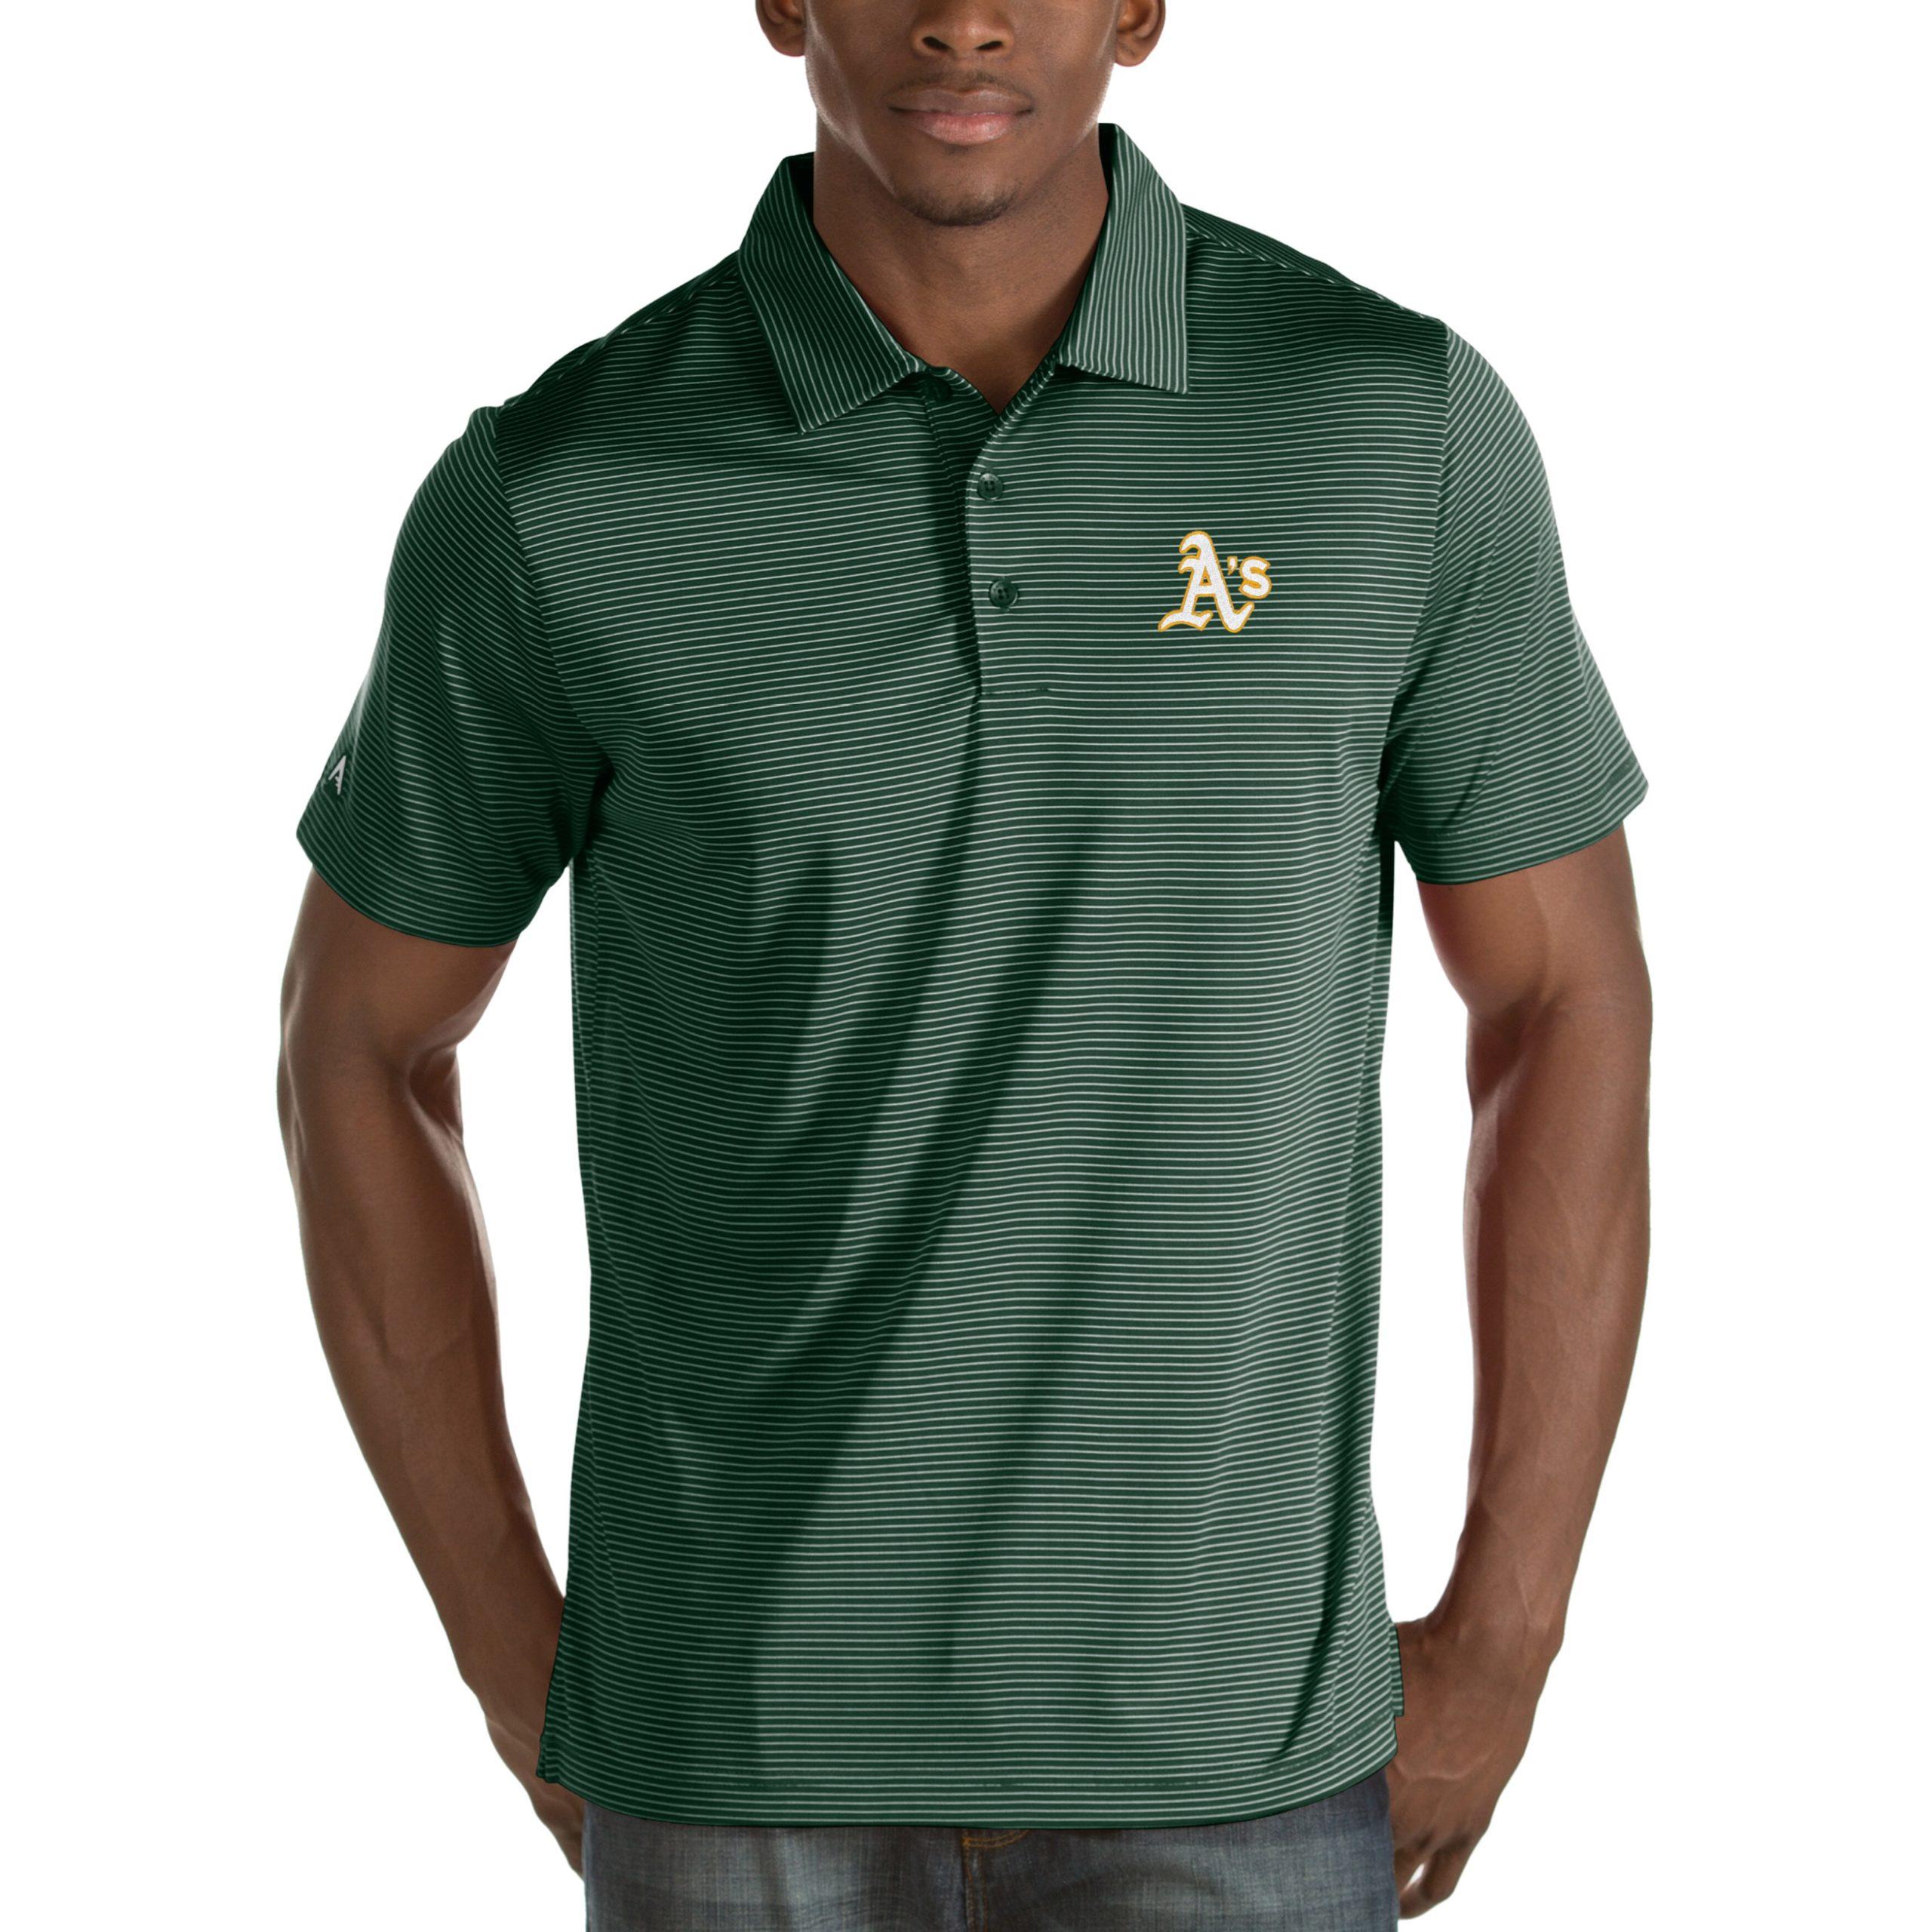 Oakland Athletics Antigua Quest Desert Dry Polo - Green